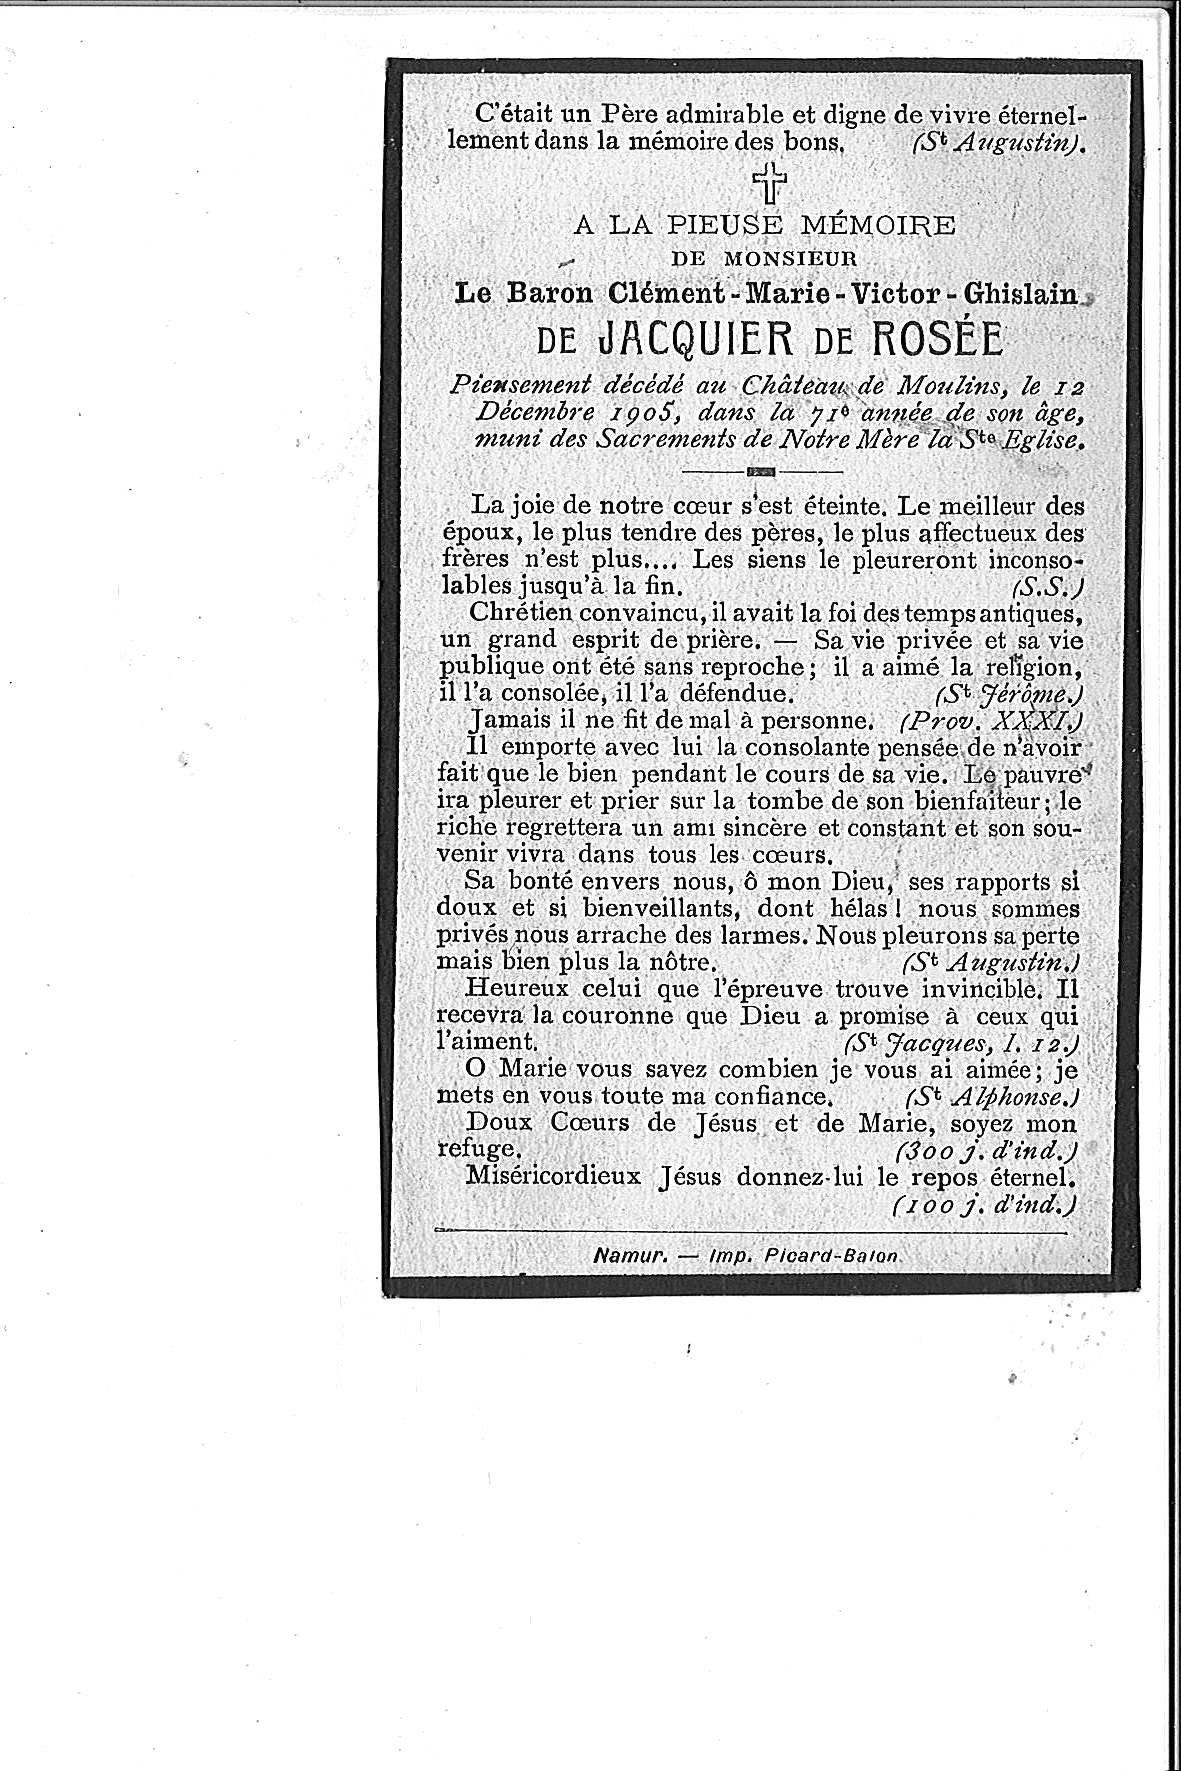 Clément-Marie-Victor-Ghislain(1905)20150422085139_00009.jpg